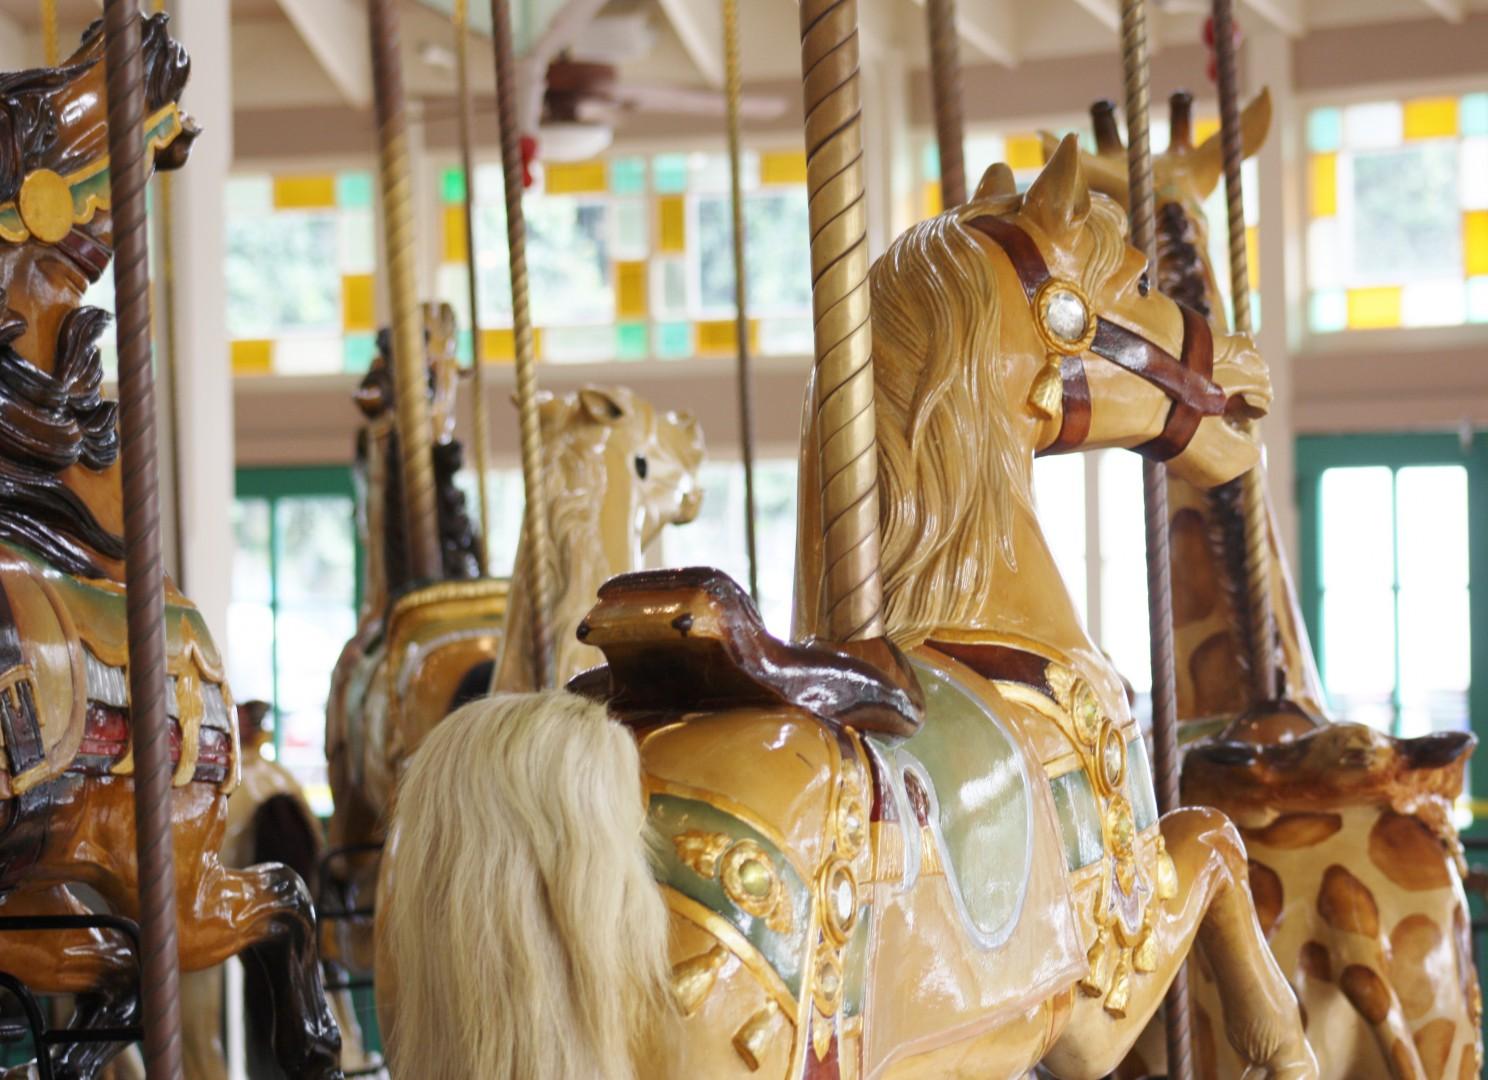 City Garden New Orleans Carousel